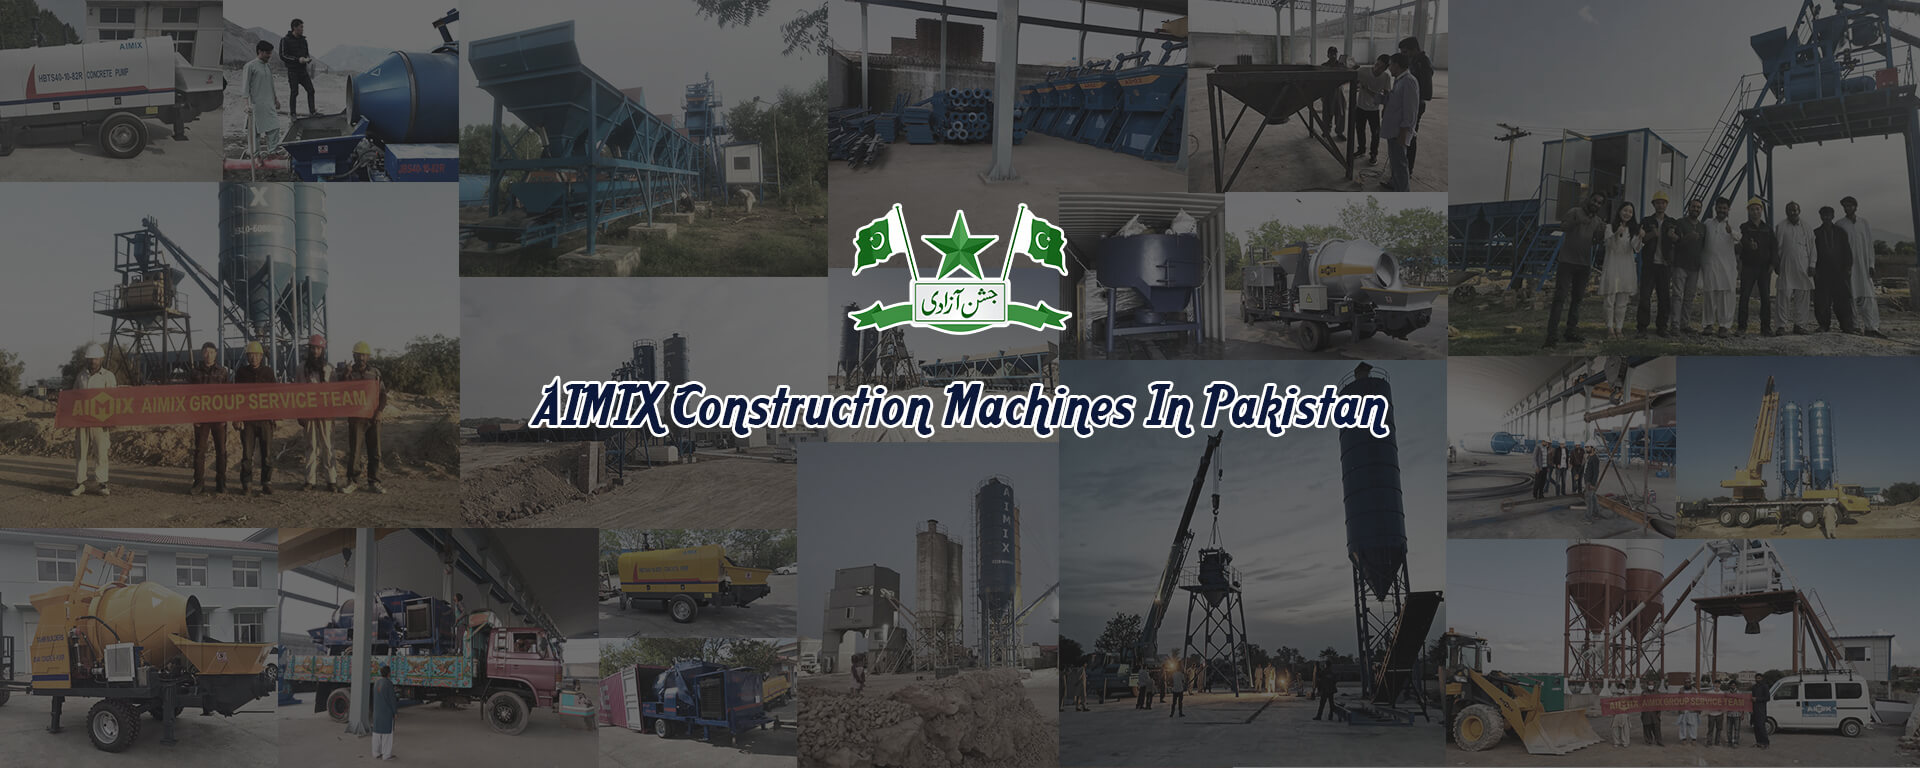 AIMIX Construction Machines in Pakistan